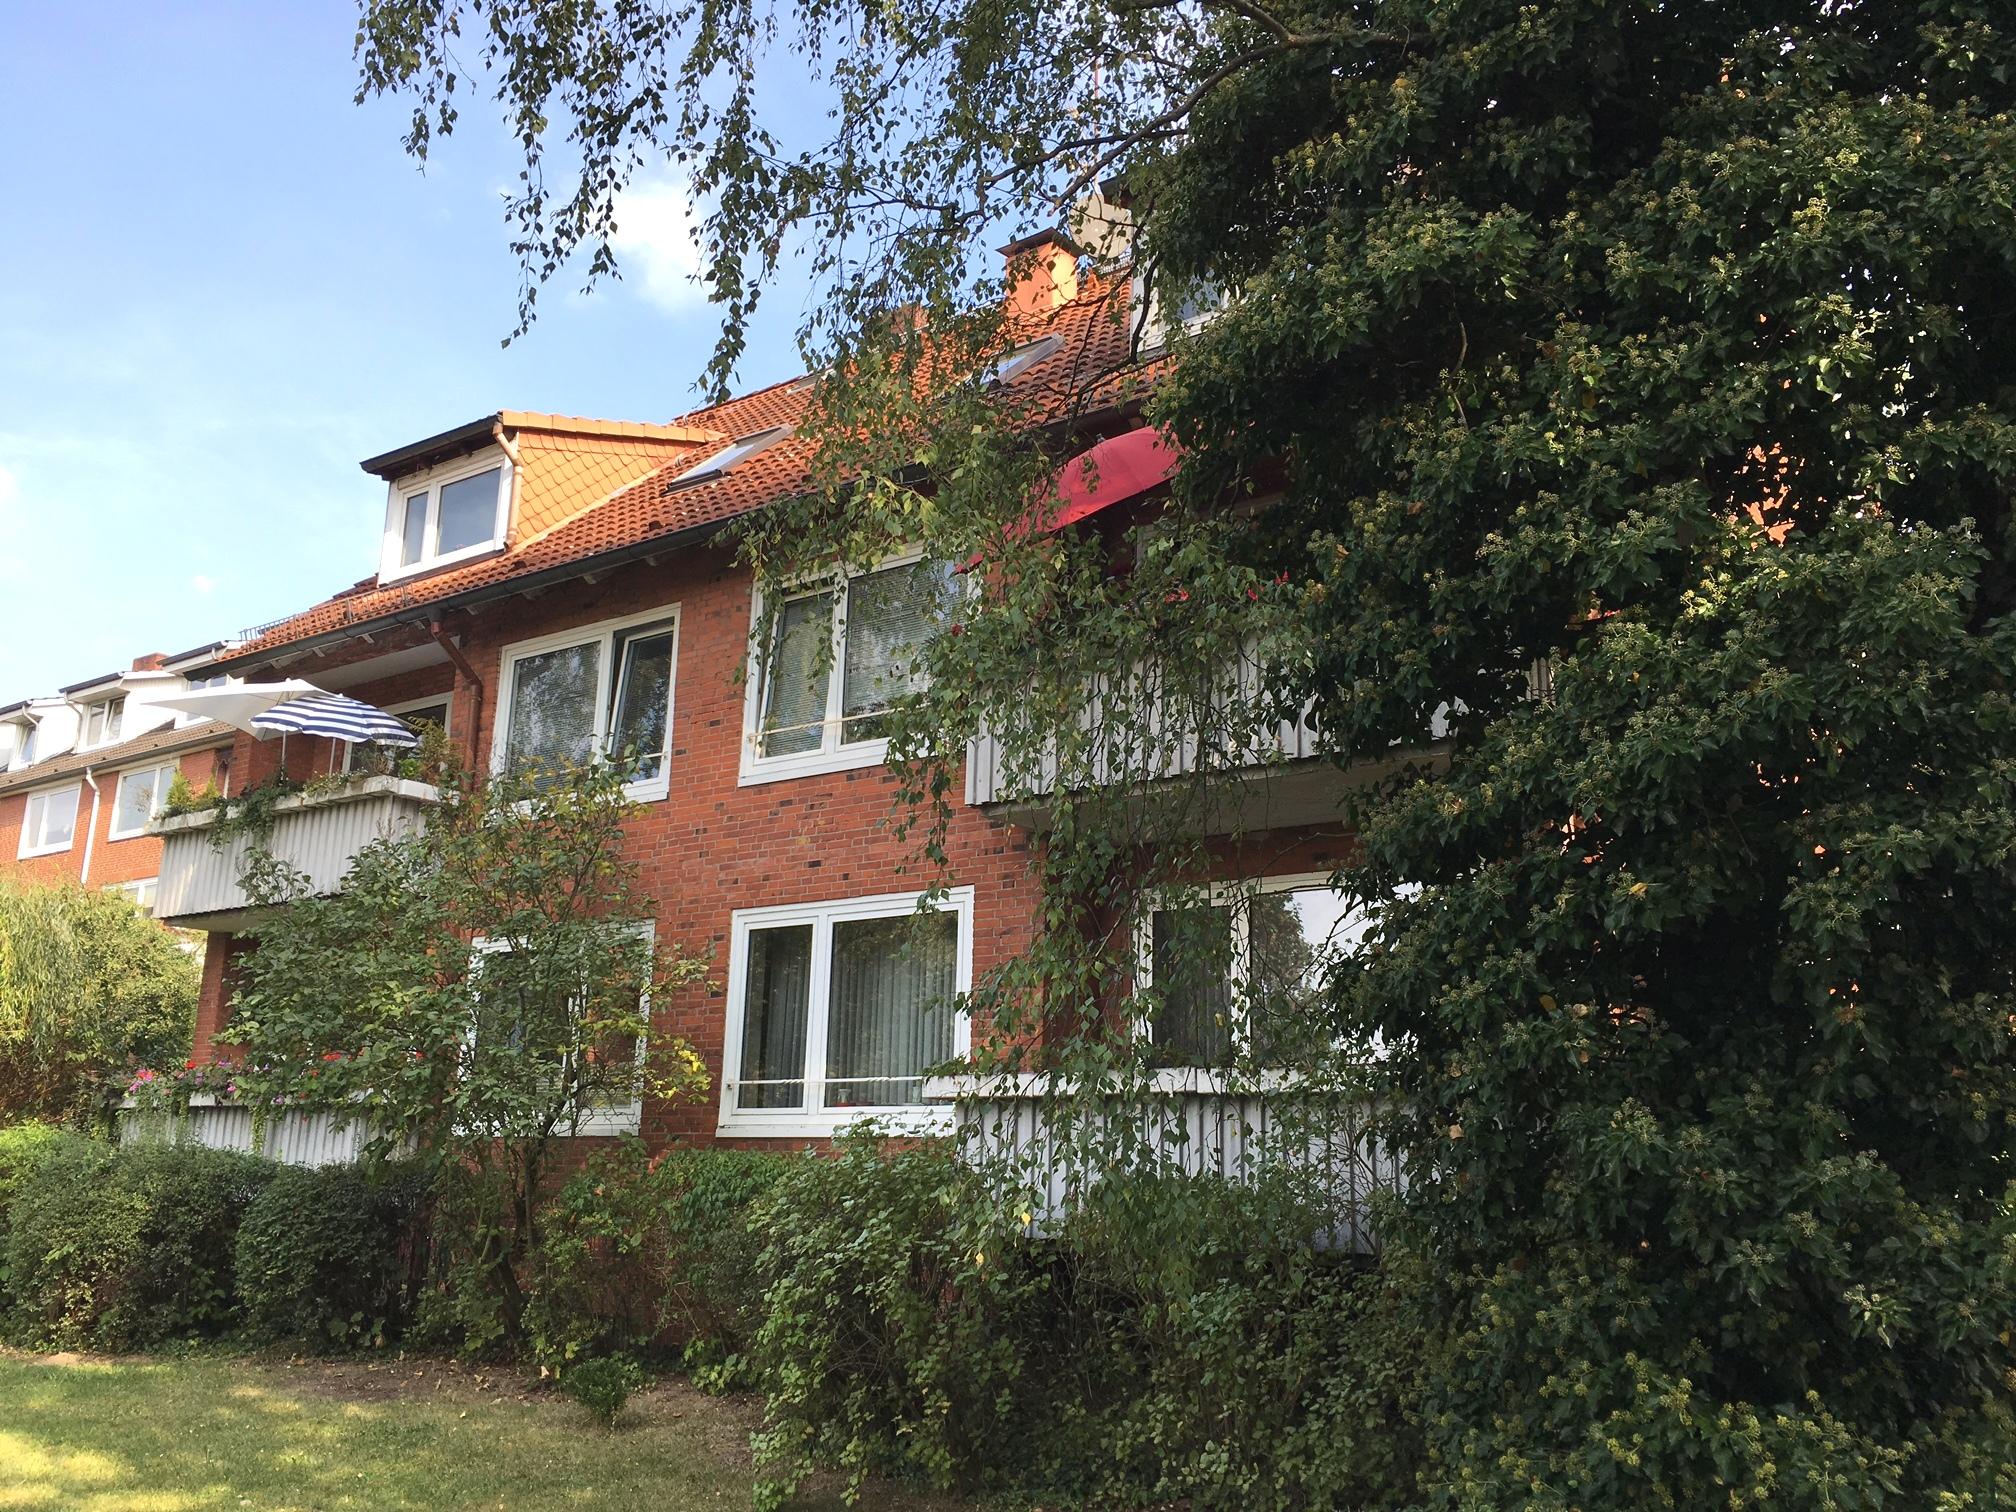 Gepflegtes Rotklinker-Mehrfamilienhaus in Bergedorf